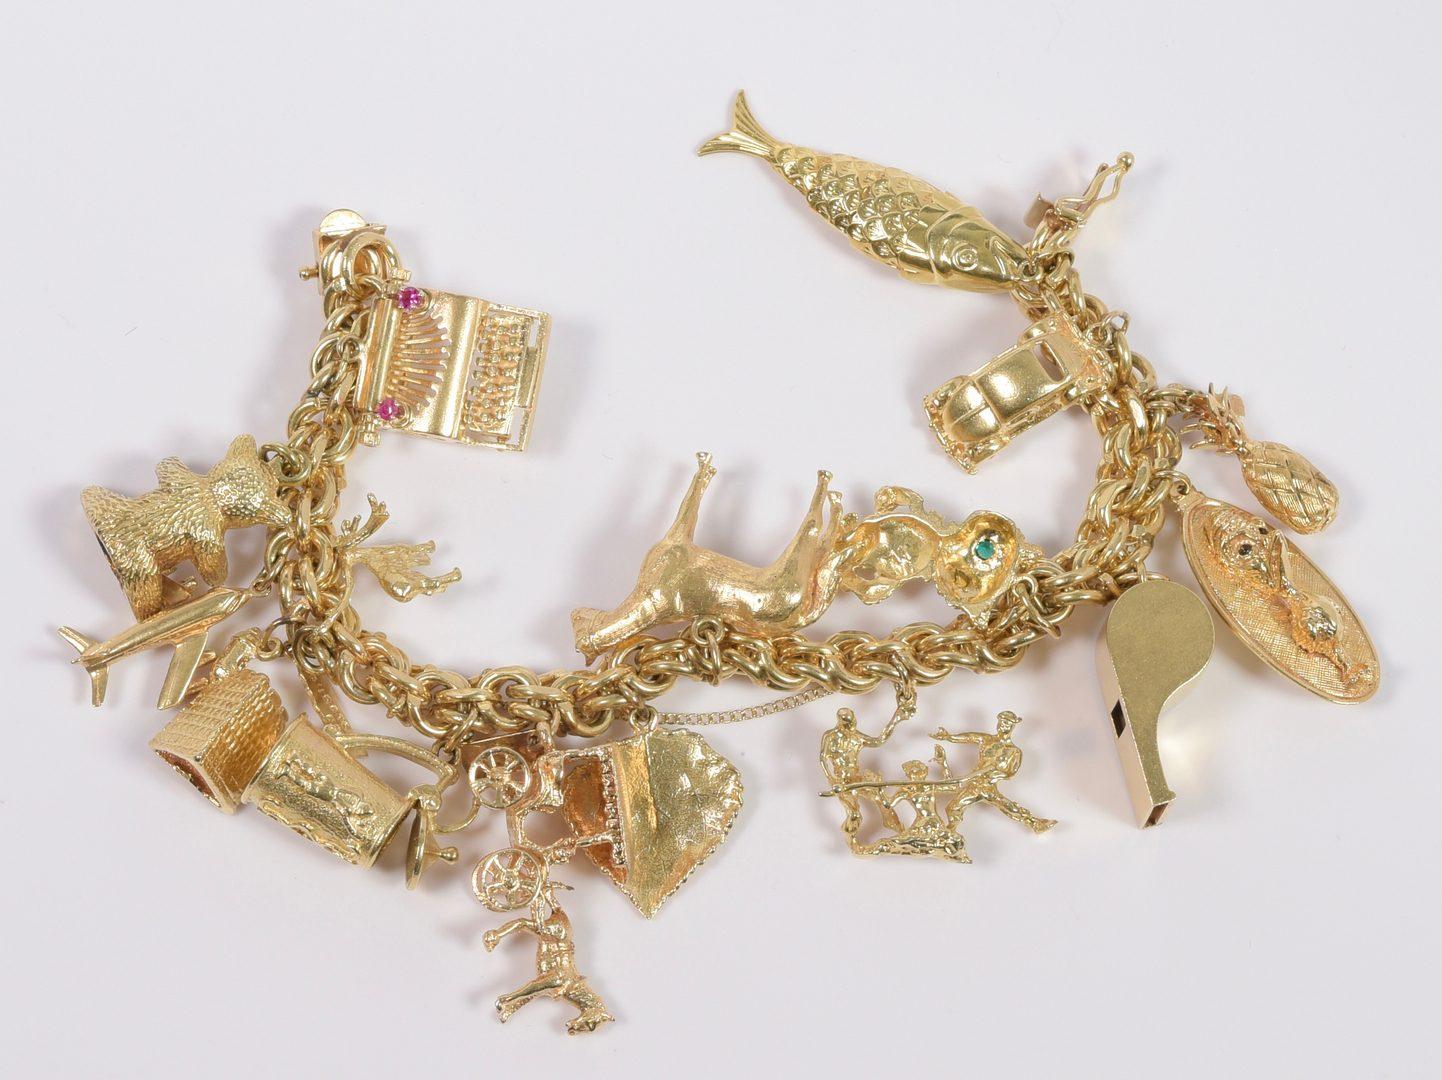 Lot 396: 14K Charm Bracelet, 16 charms, 131 grams